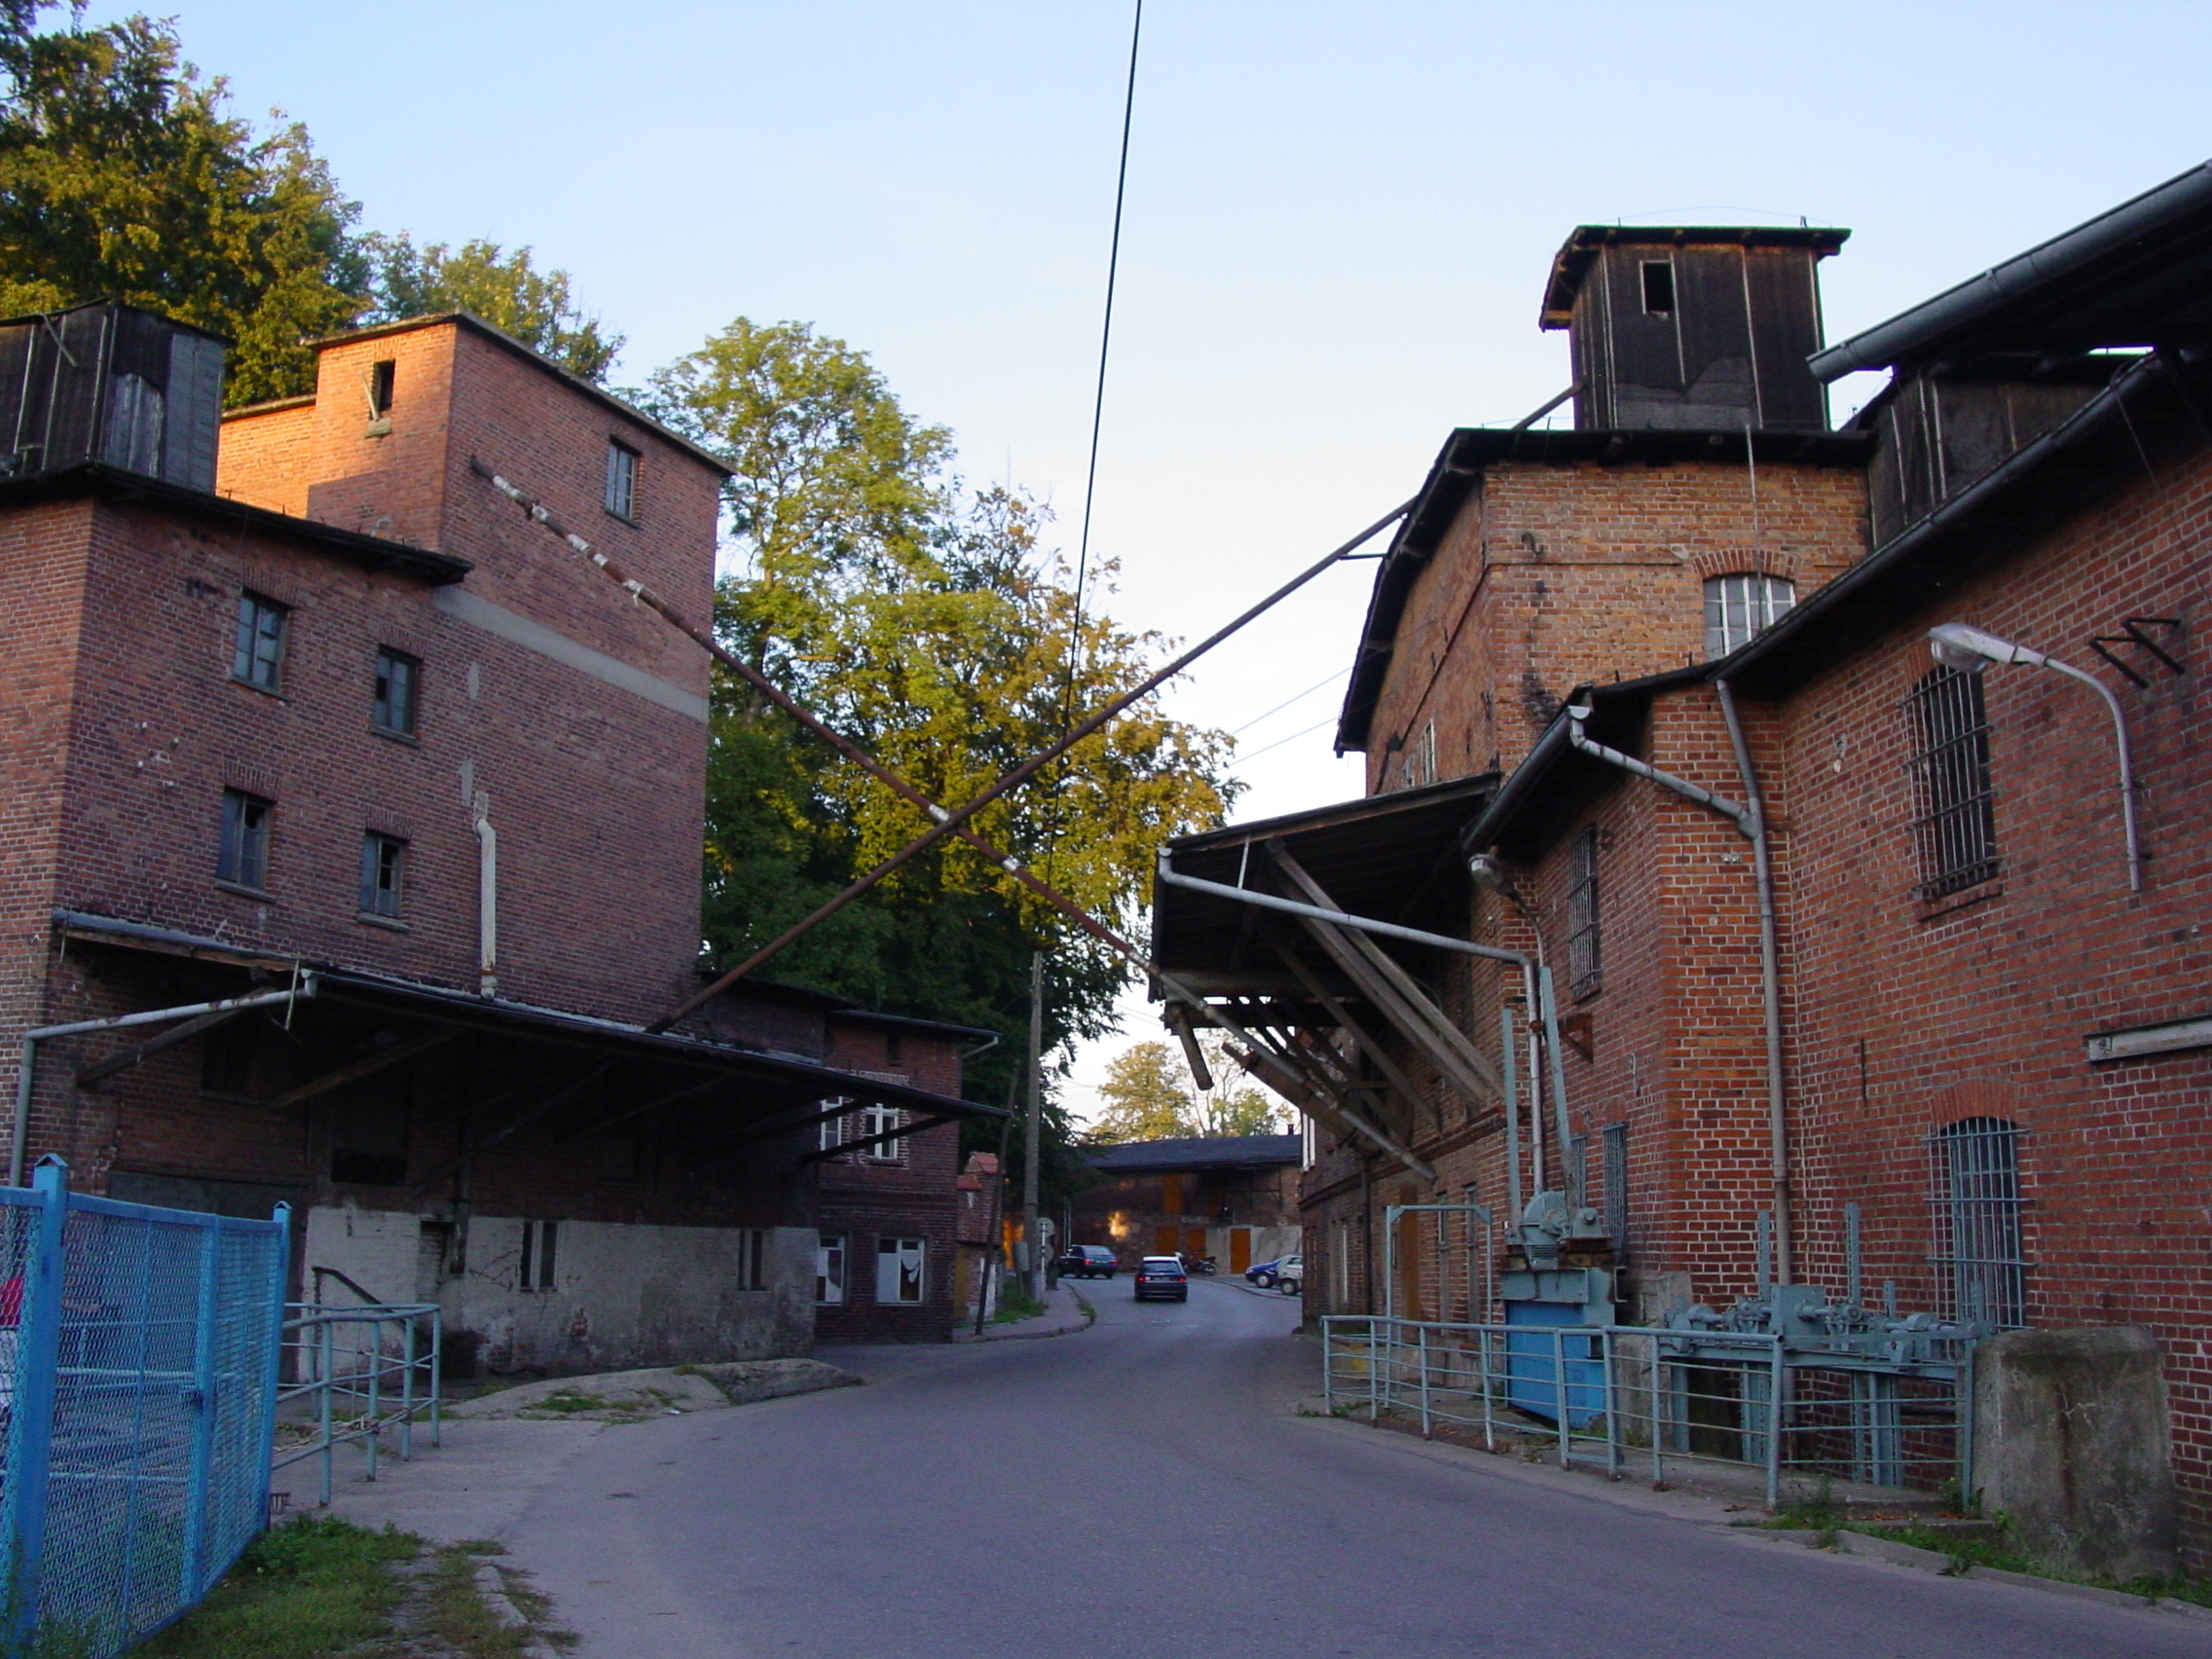 Òbrôzk:Zukowo-mlyny2.JPG - Kaszëbskô Wikipedijô